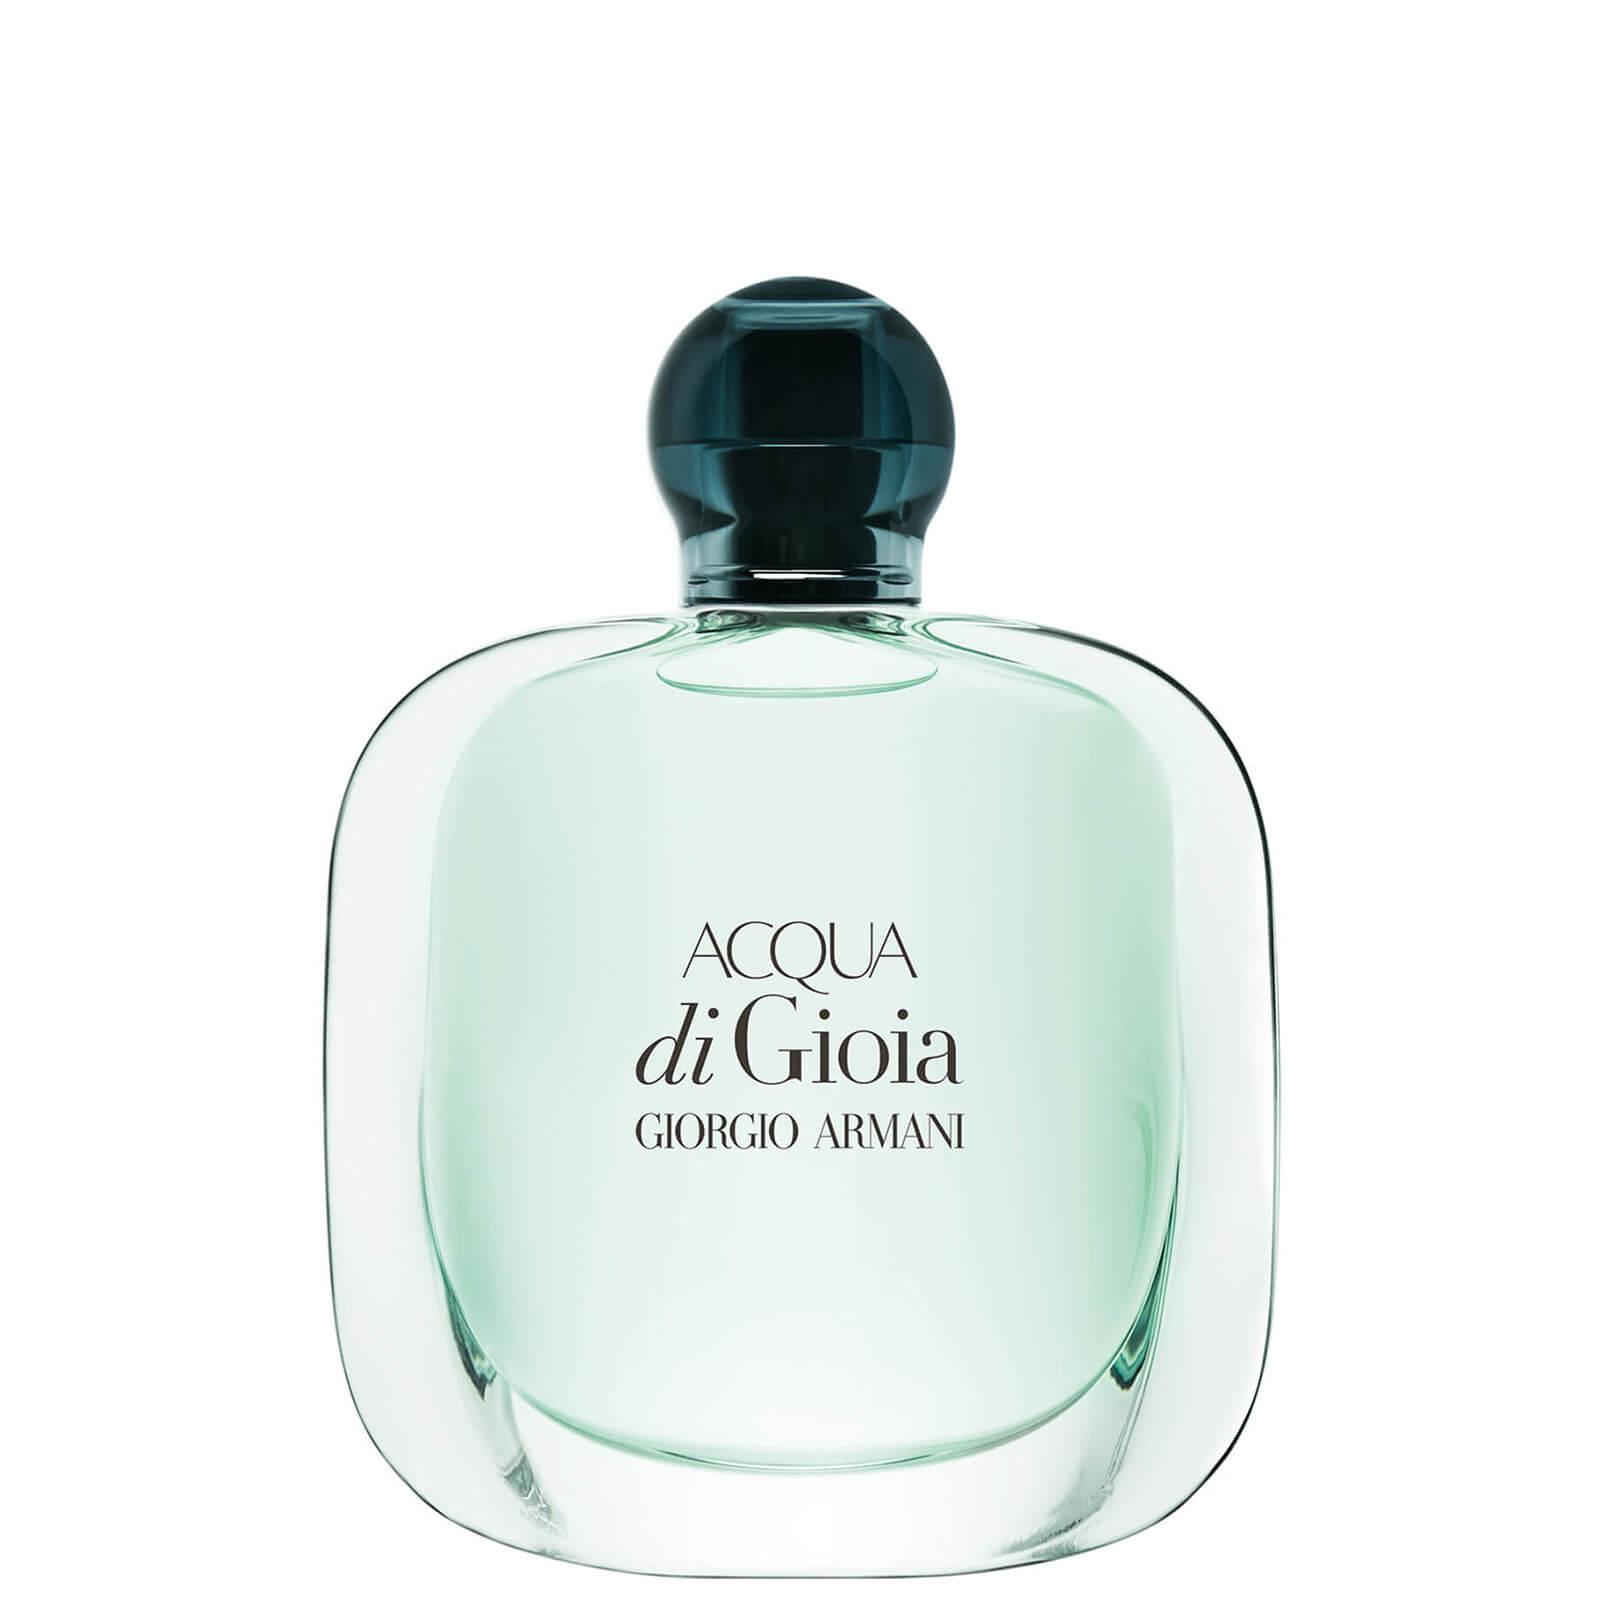 Image of Armani Acqua Di Gioia Eau de Parfum (Various Sizes) - 50ml